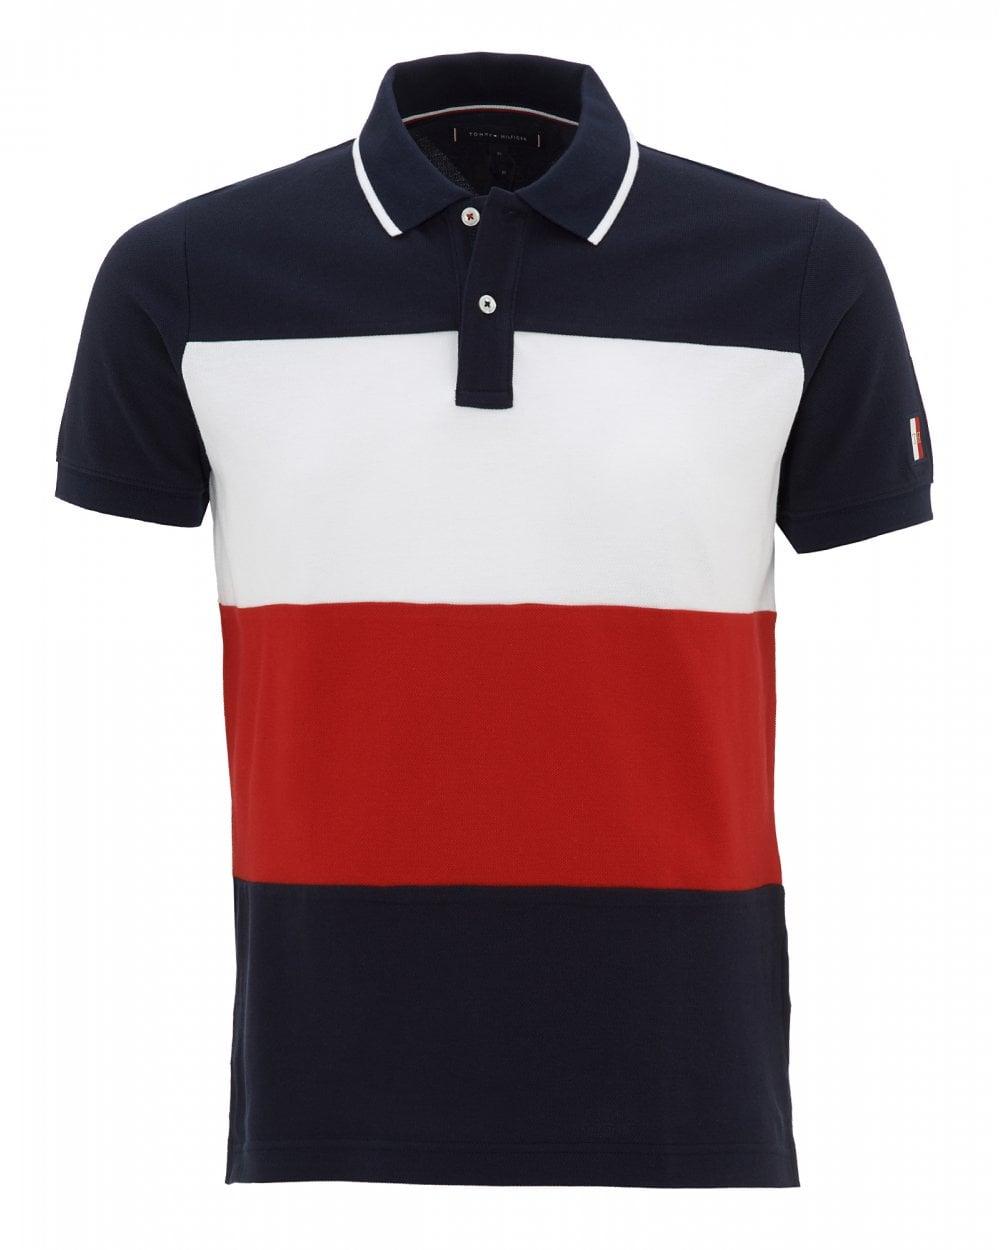 finest selection bfaa4 4e609 Mens Colour Block Slim Fit Polo Shirt